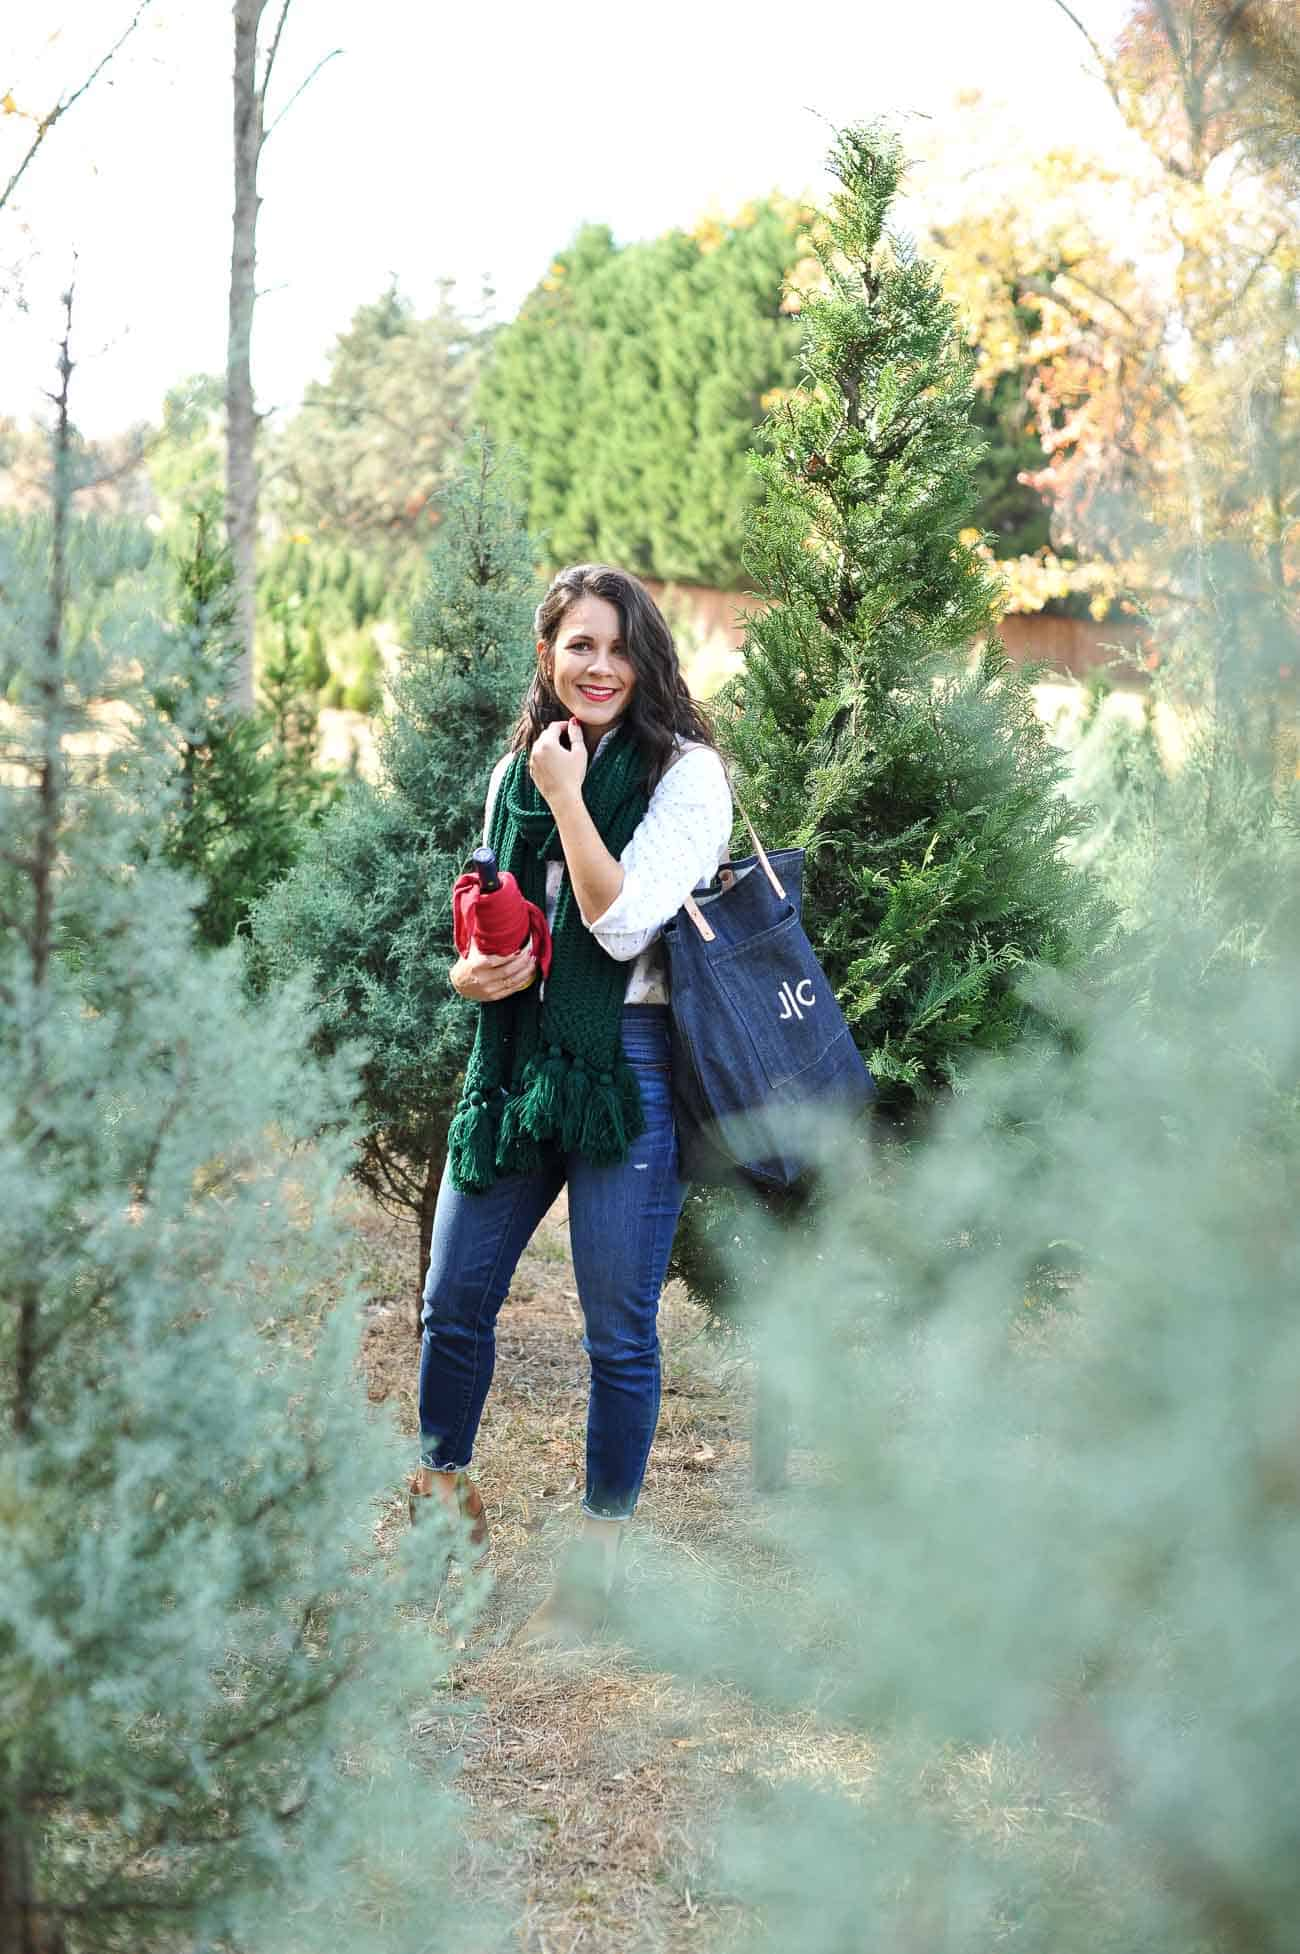 Christmas Tree Photo Shoot Ideas My Style Vita